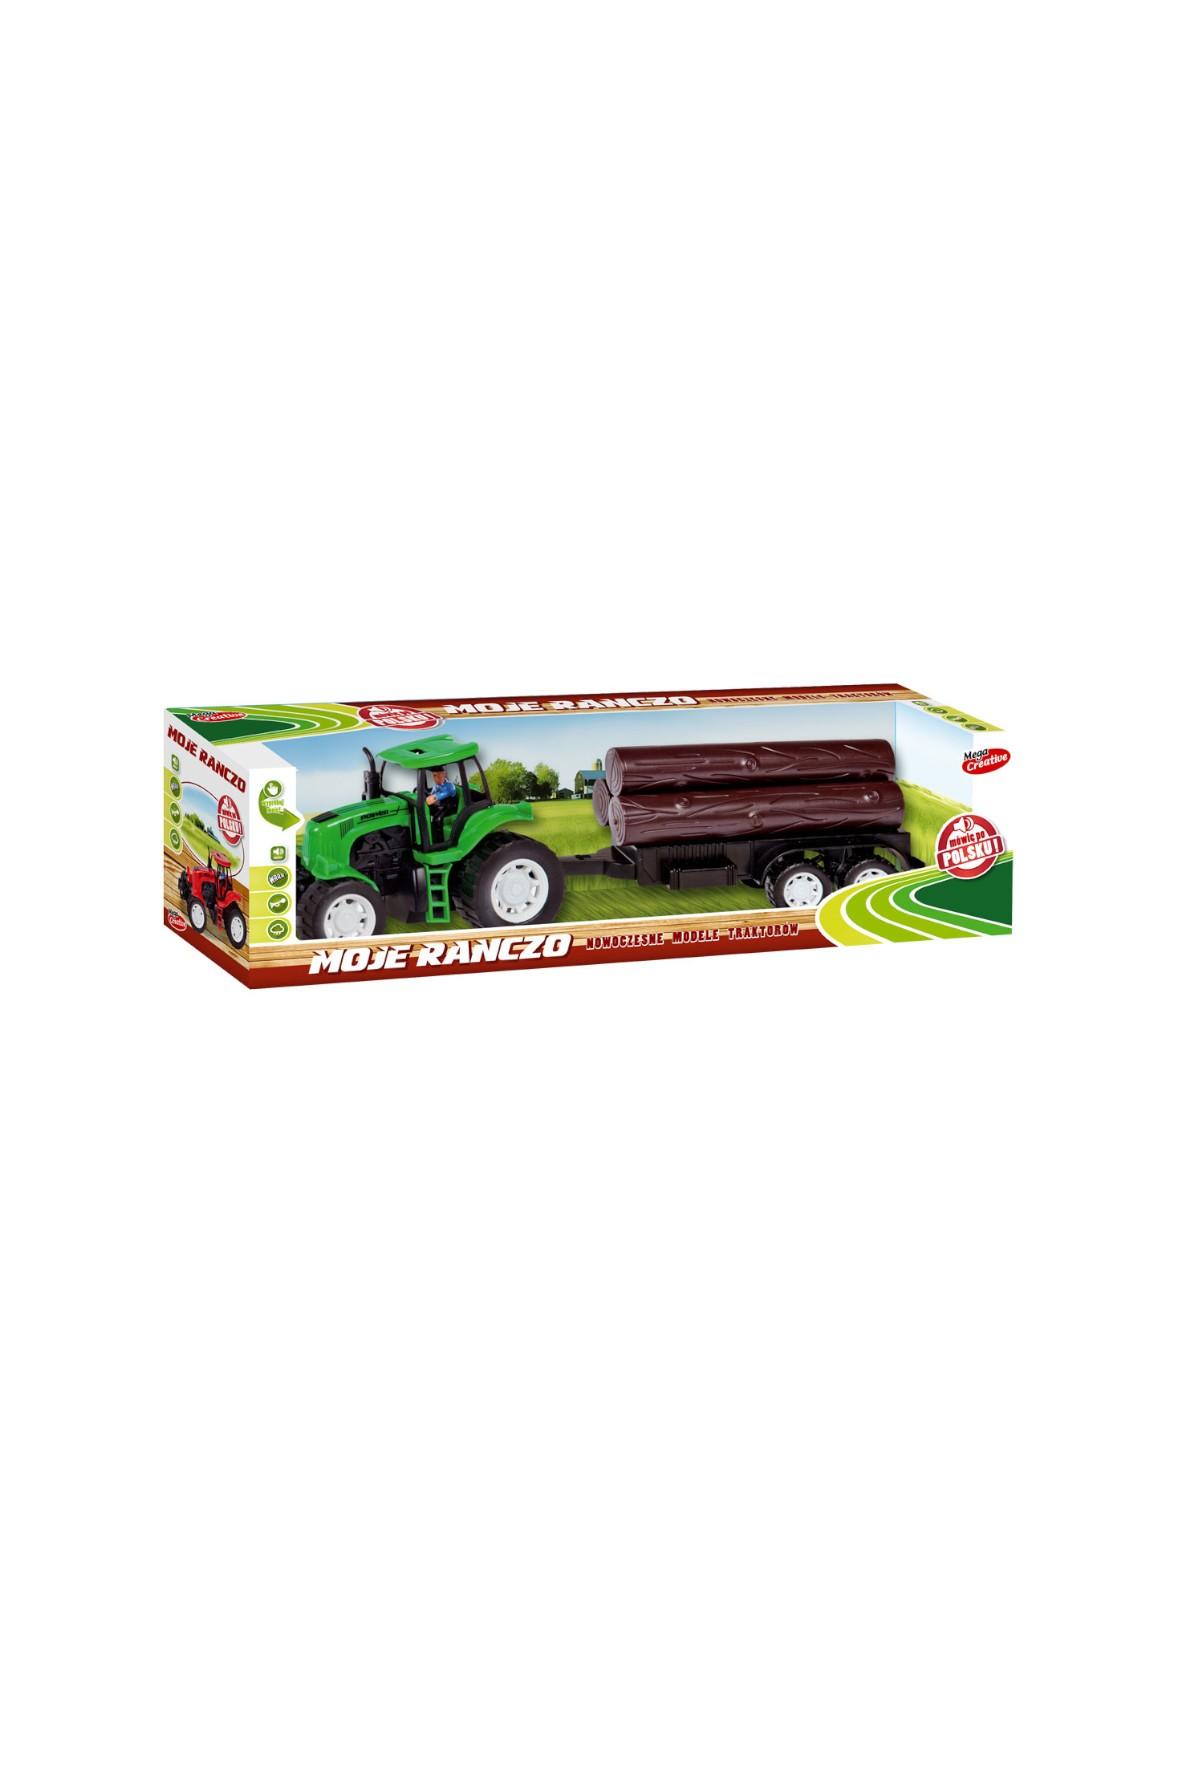 Traktor zabawka dla dziecka 48cm